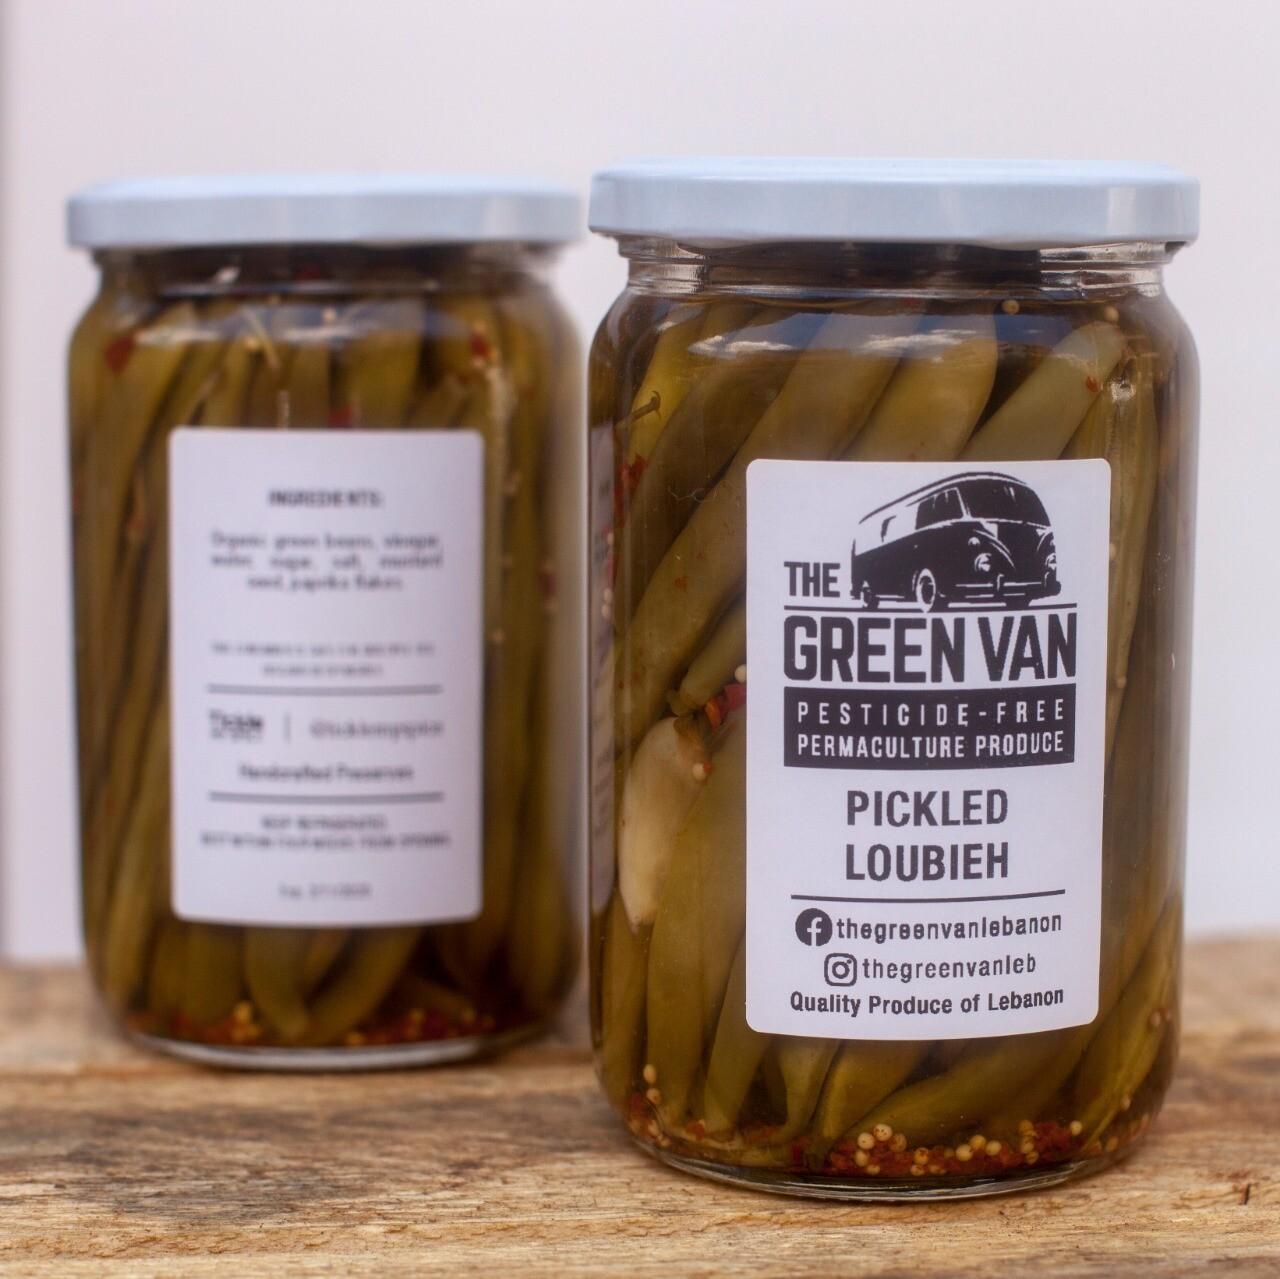 Green Beans Pickled  مخلل الفاصوليا الخضراء (Jar) - The Green Van Permaculture